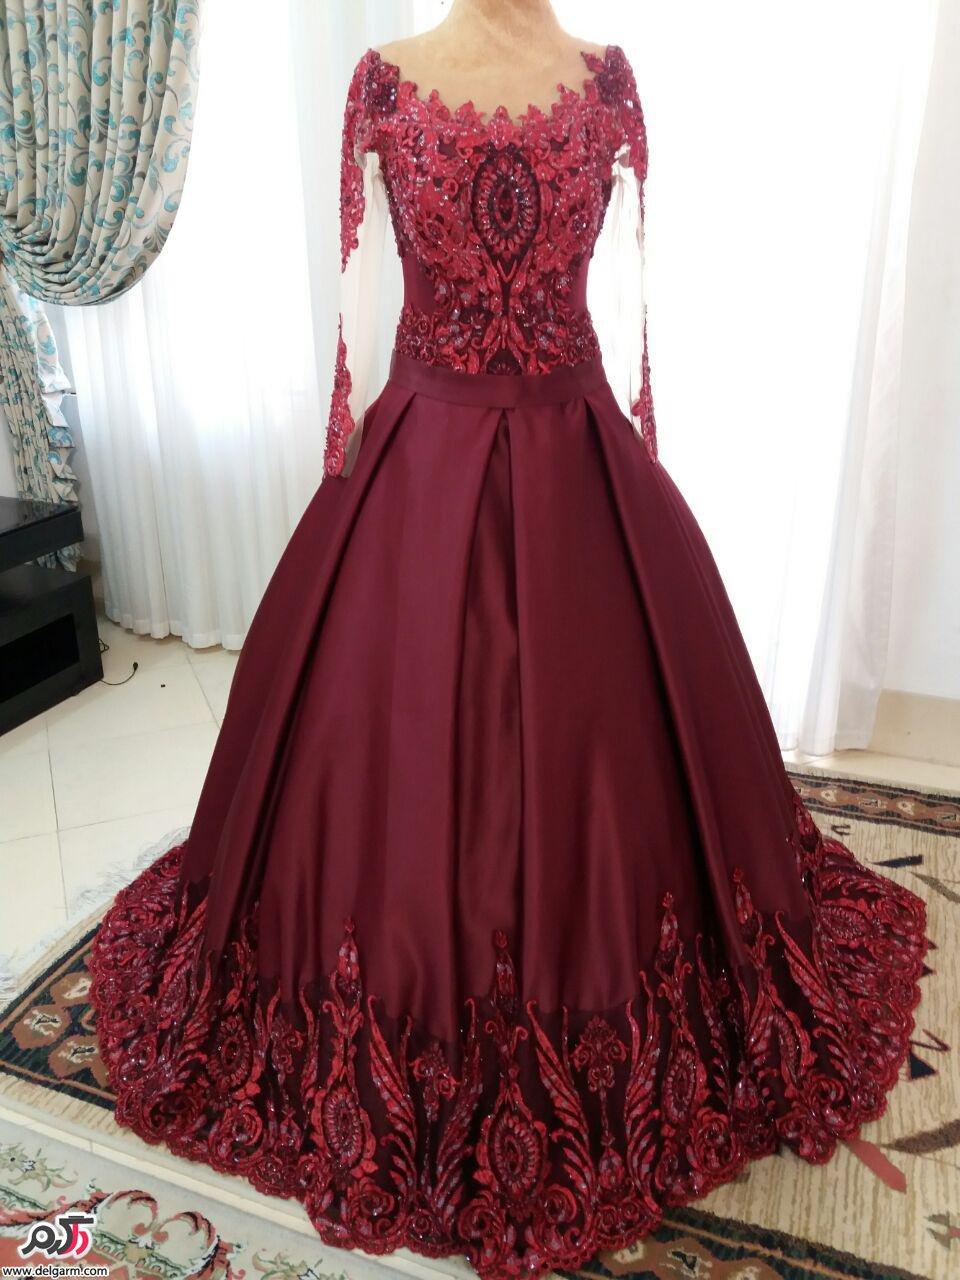 عکس مدل لباس مجلسی خوشگل